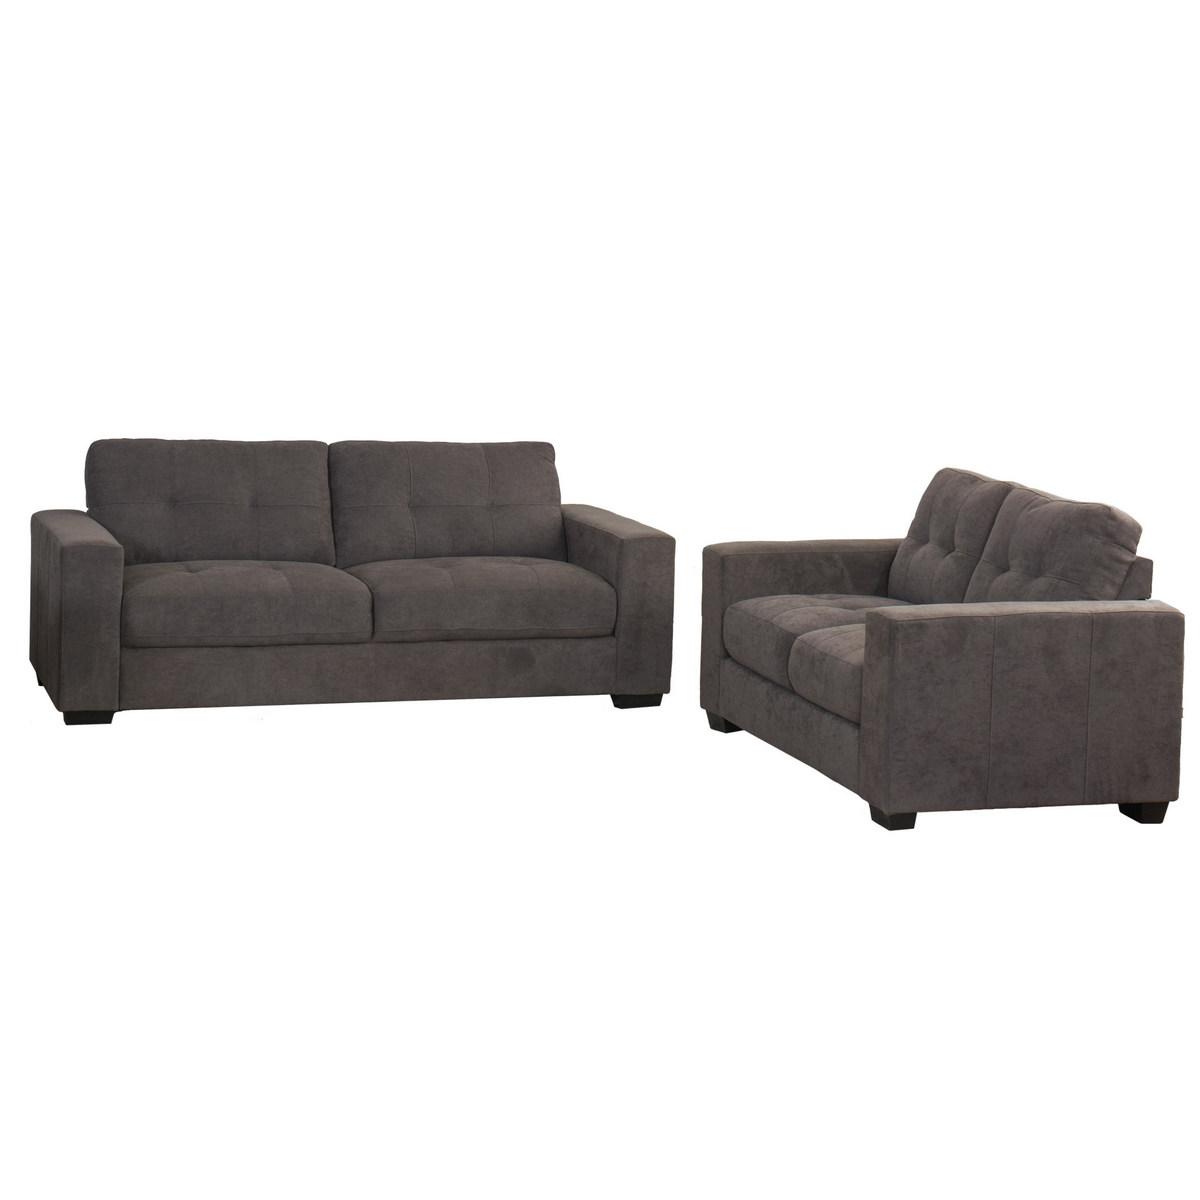 Corliving Tufted Sofa Set